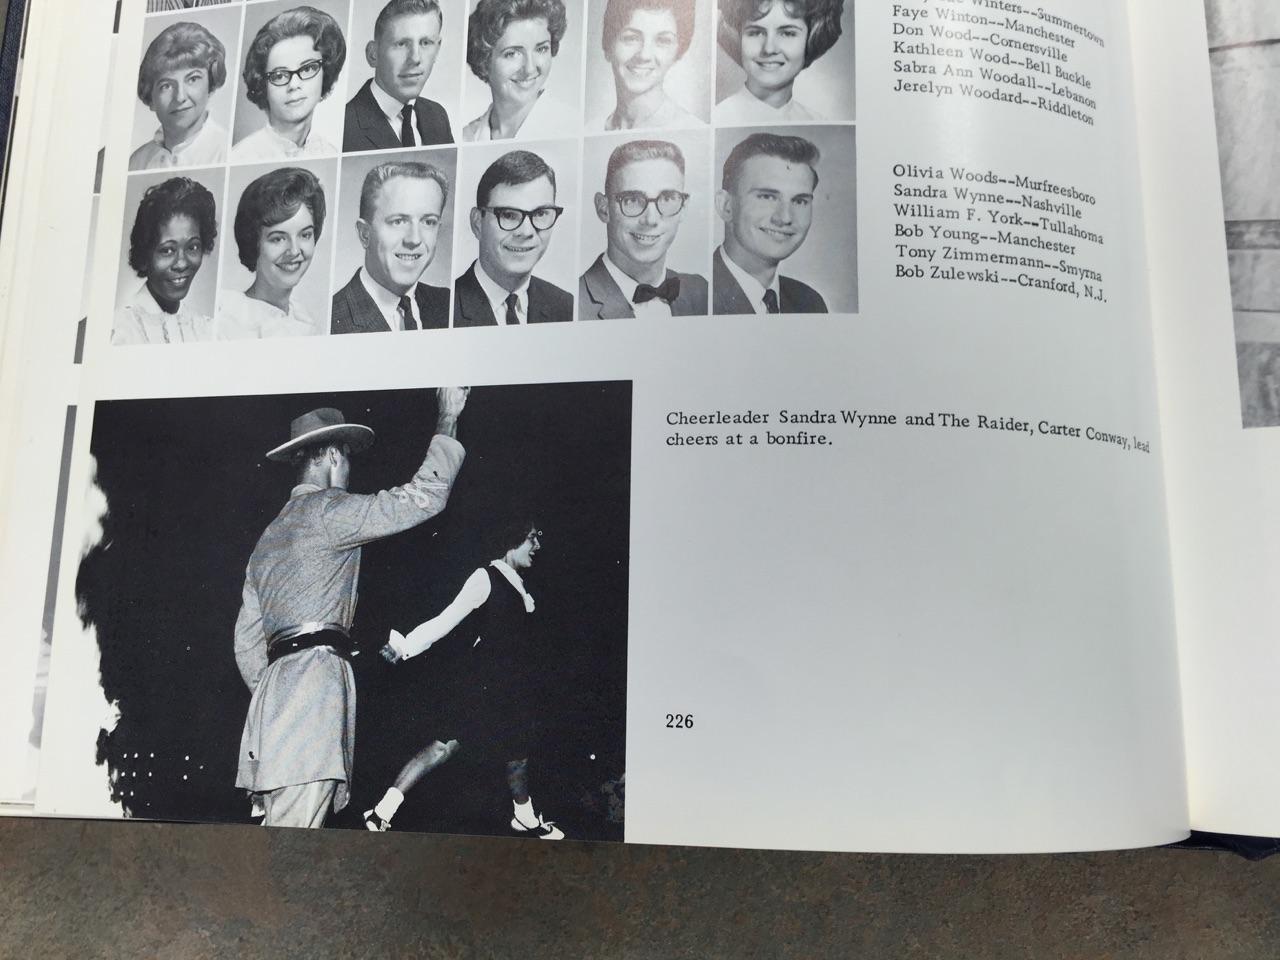 1964 MTSU Yearbook